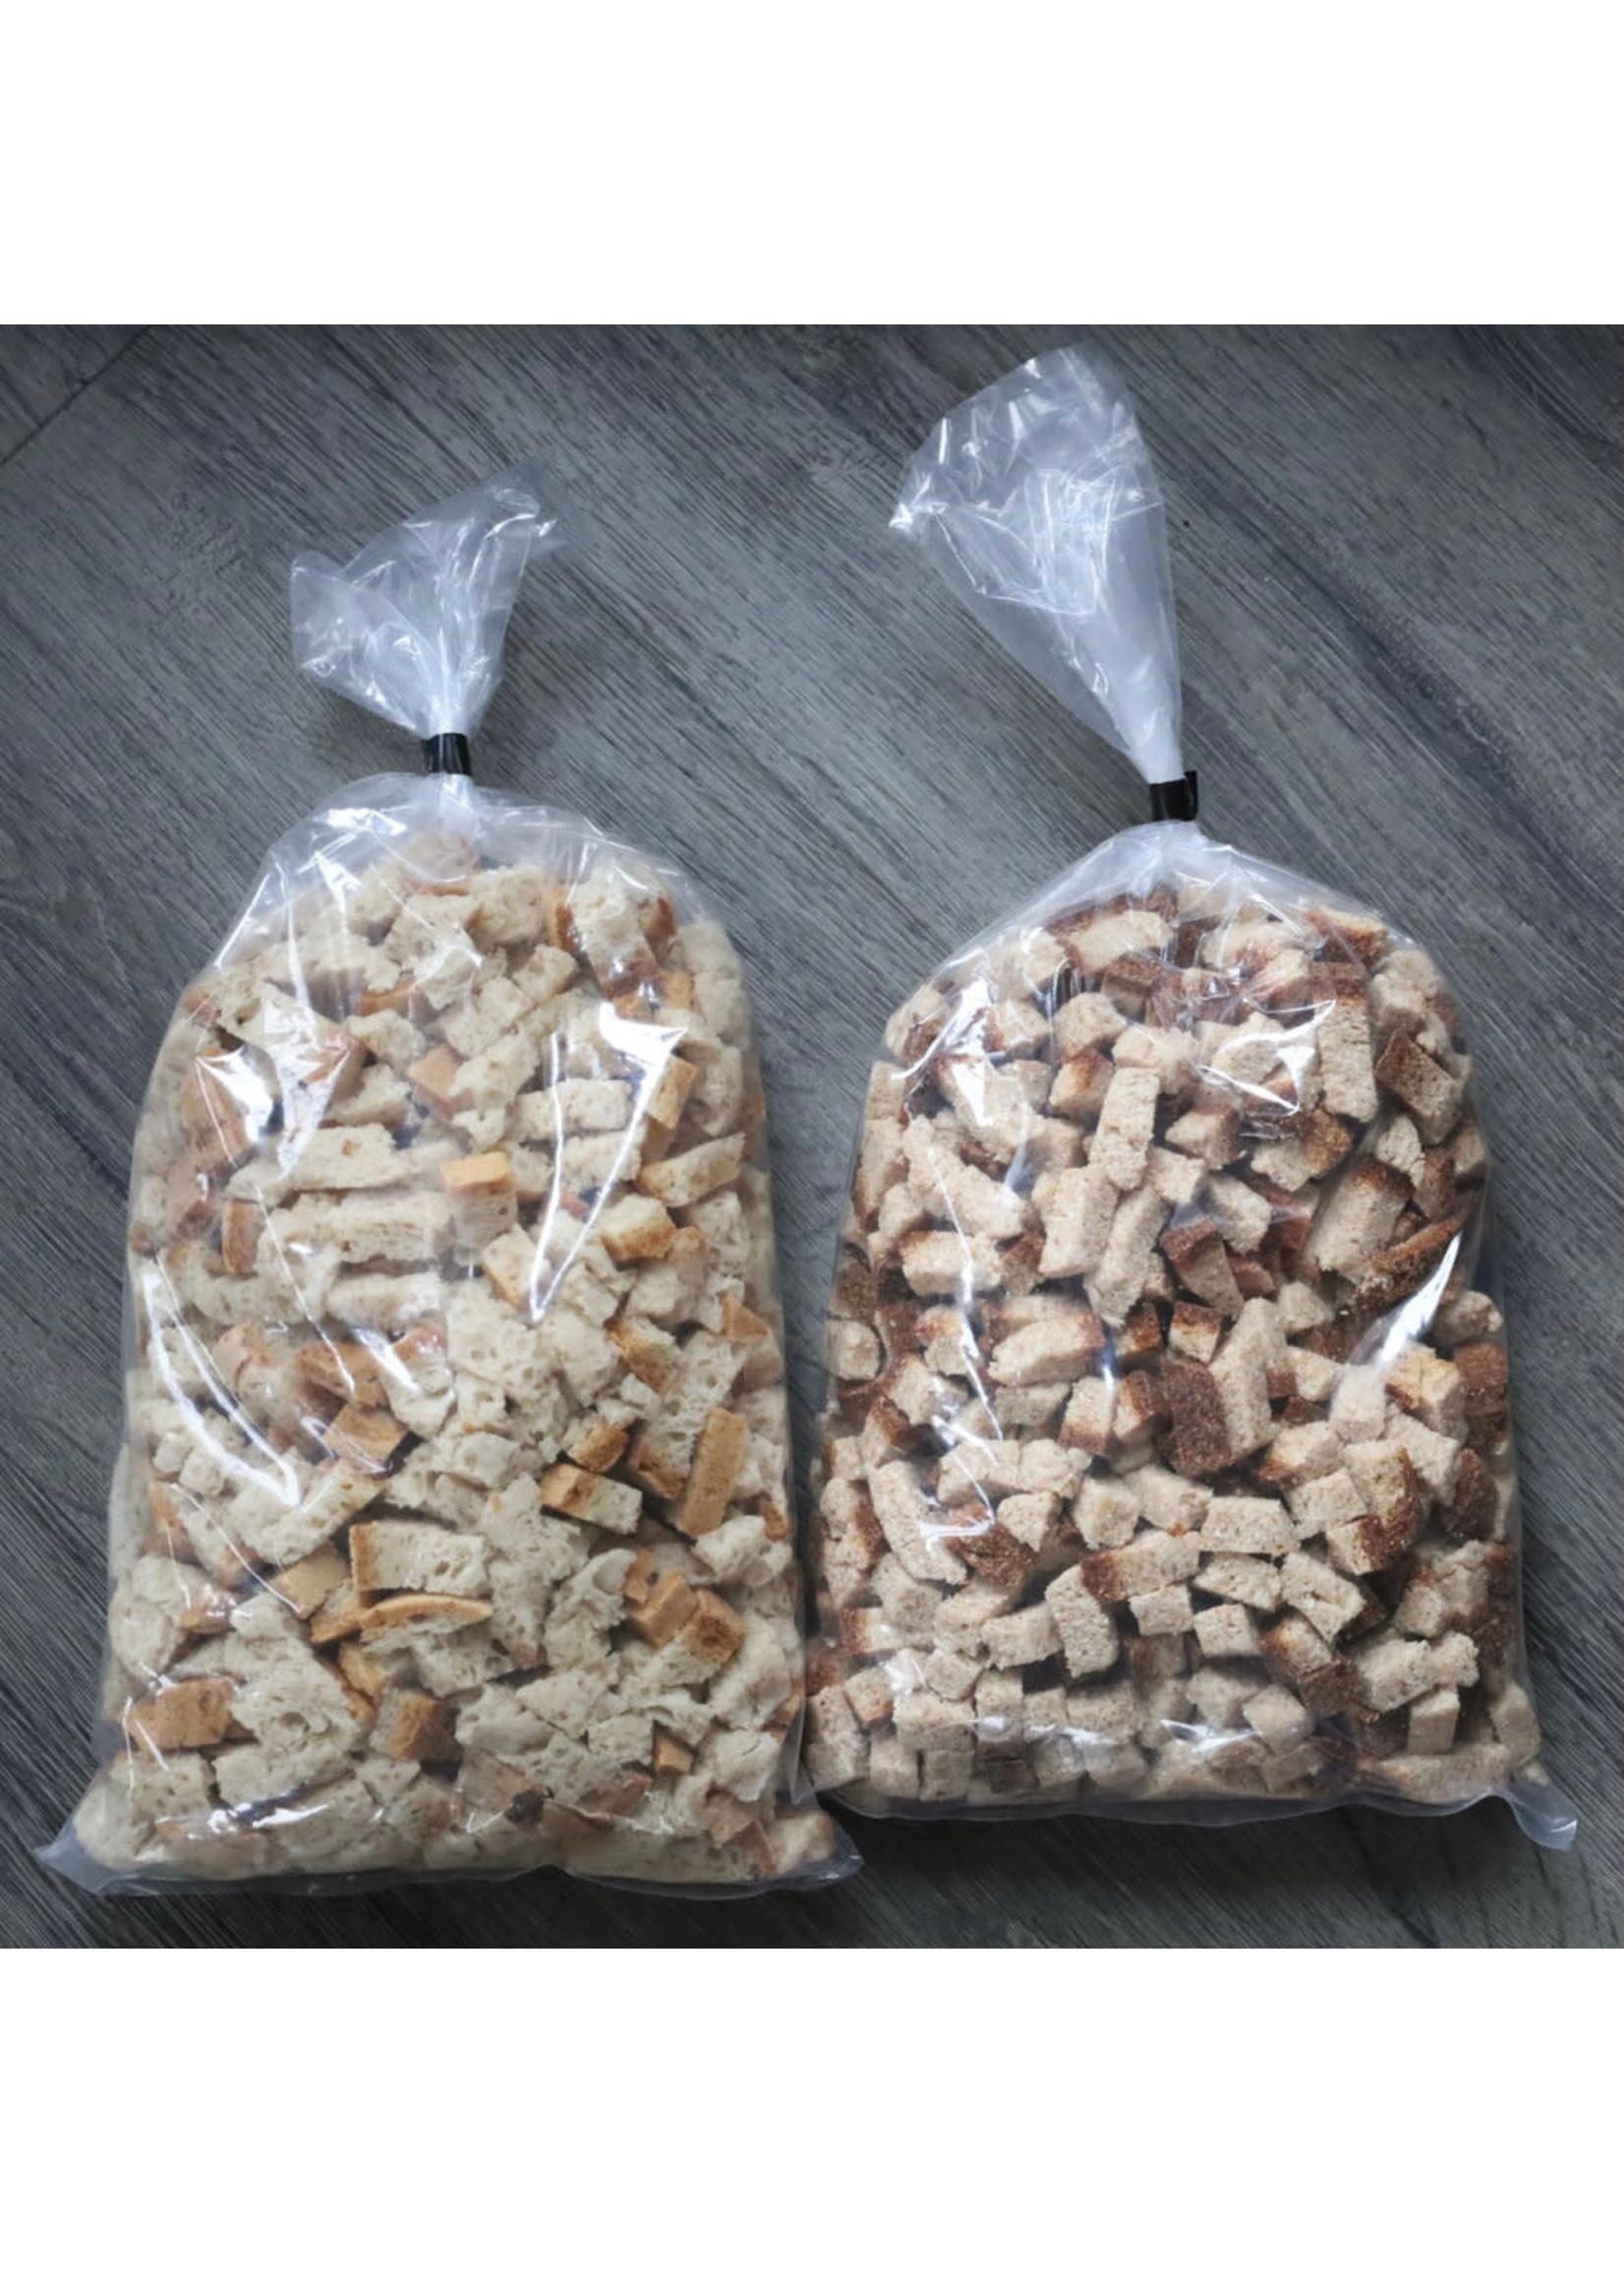 Thornbury Bakery Thornbury Bakery- KETO Stuffing Mix (GF)